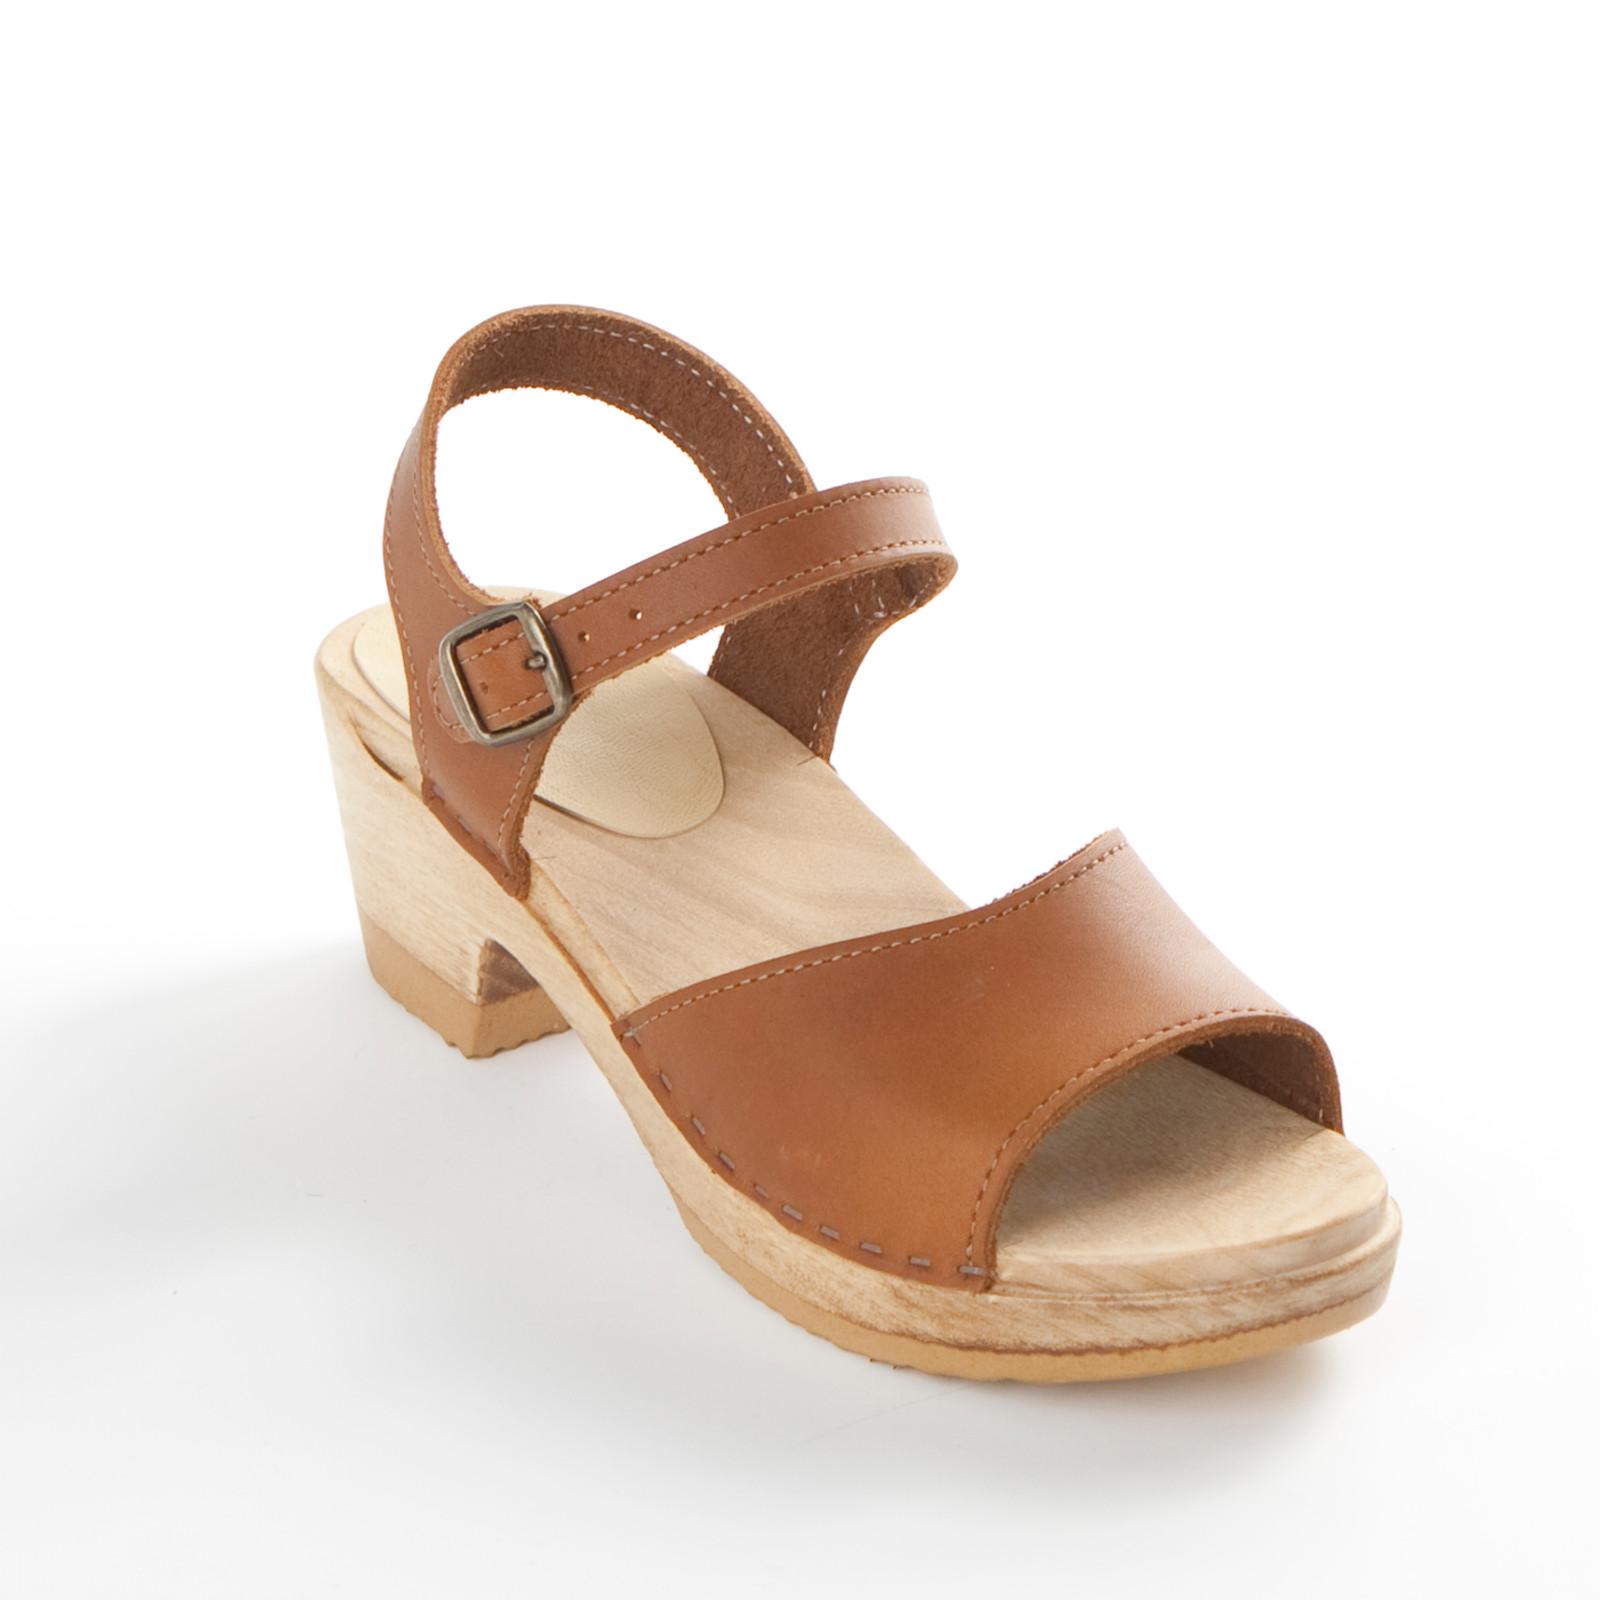 Open Toe Sandal Clogs - Ankle Straps